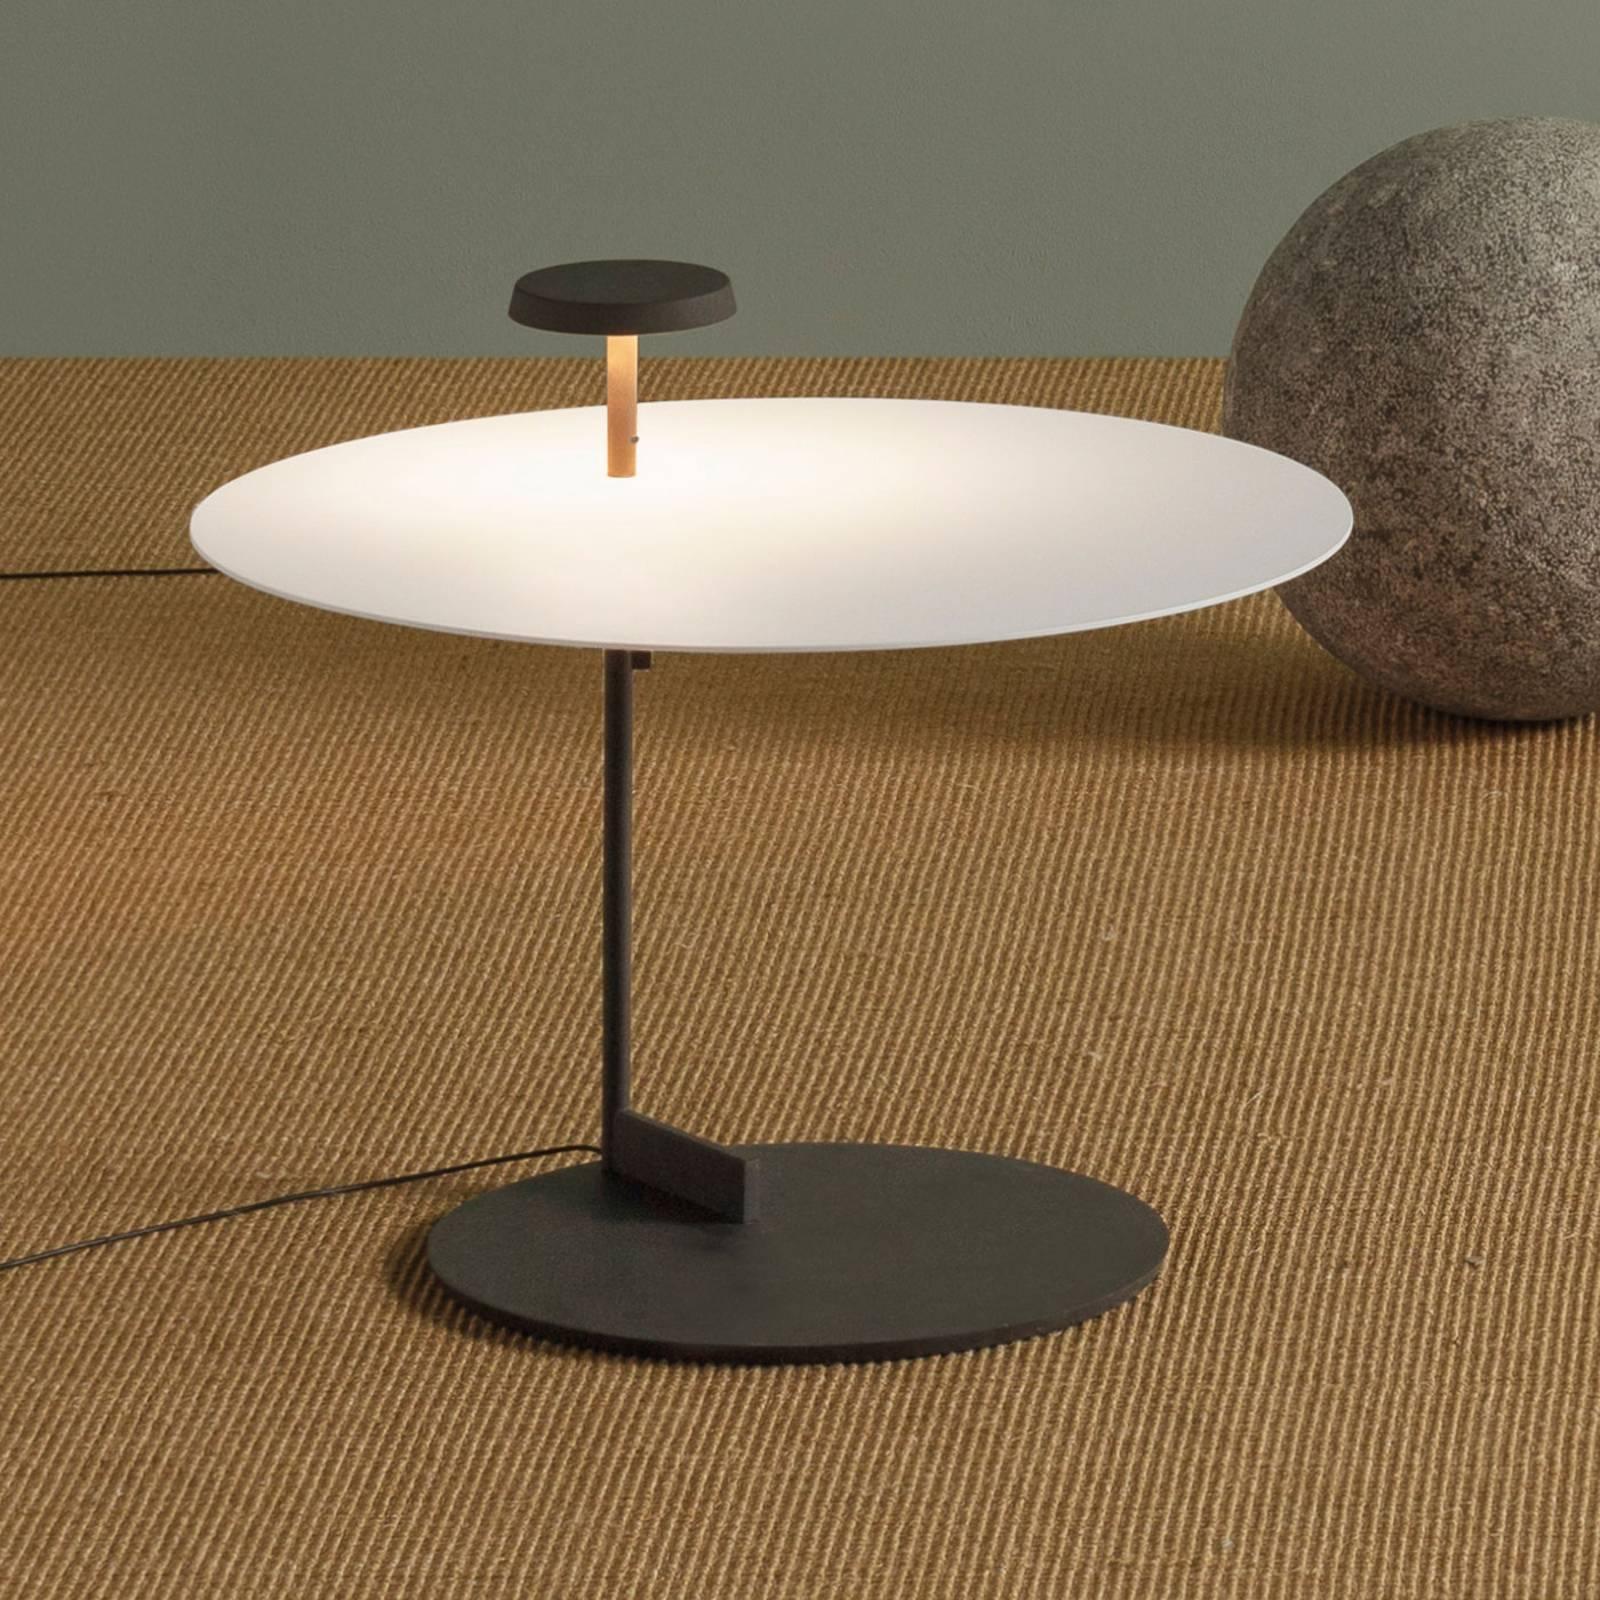 Vibia Flat LED da interrare 43 cm bianco, dimming